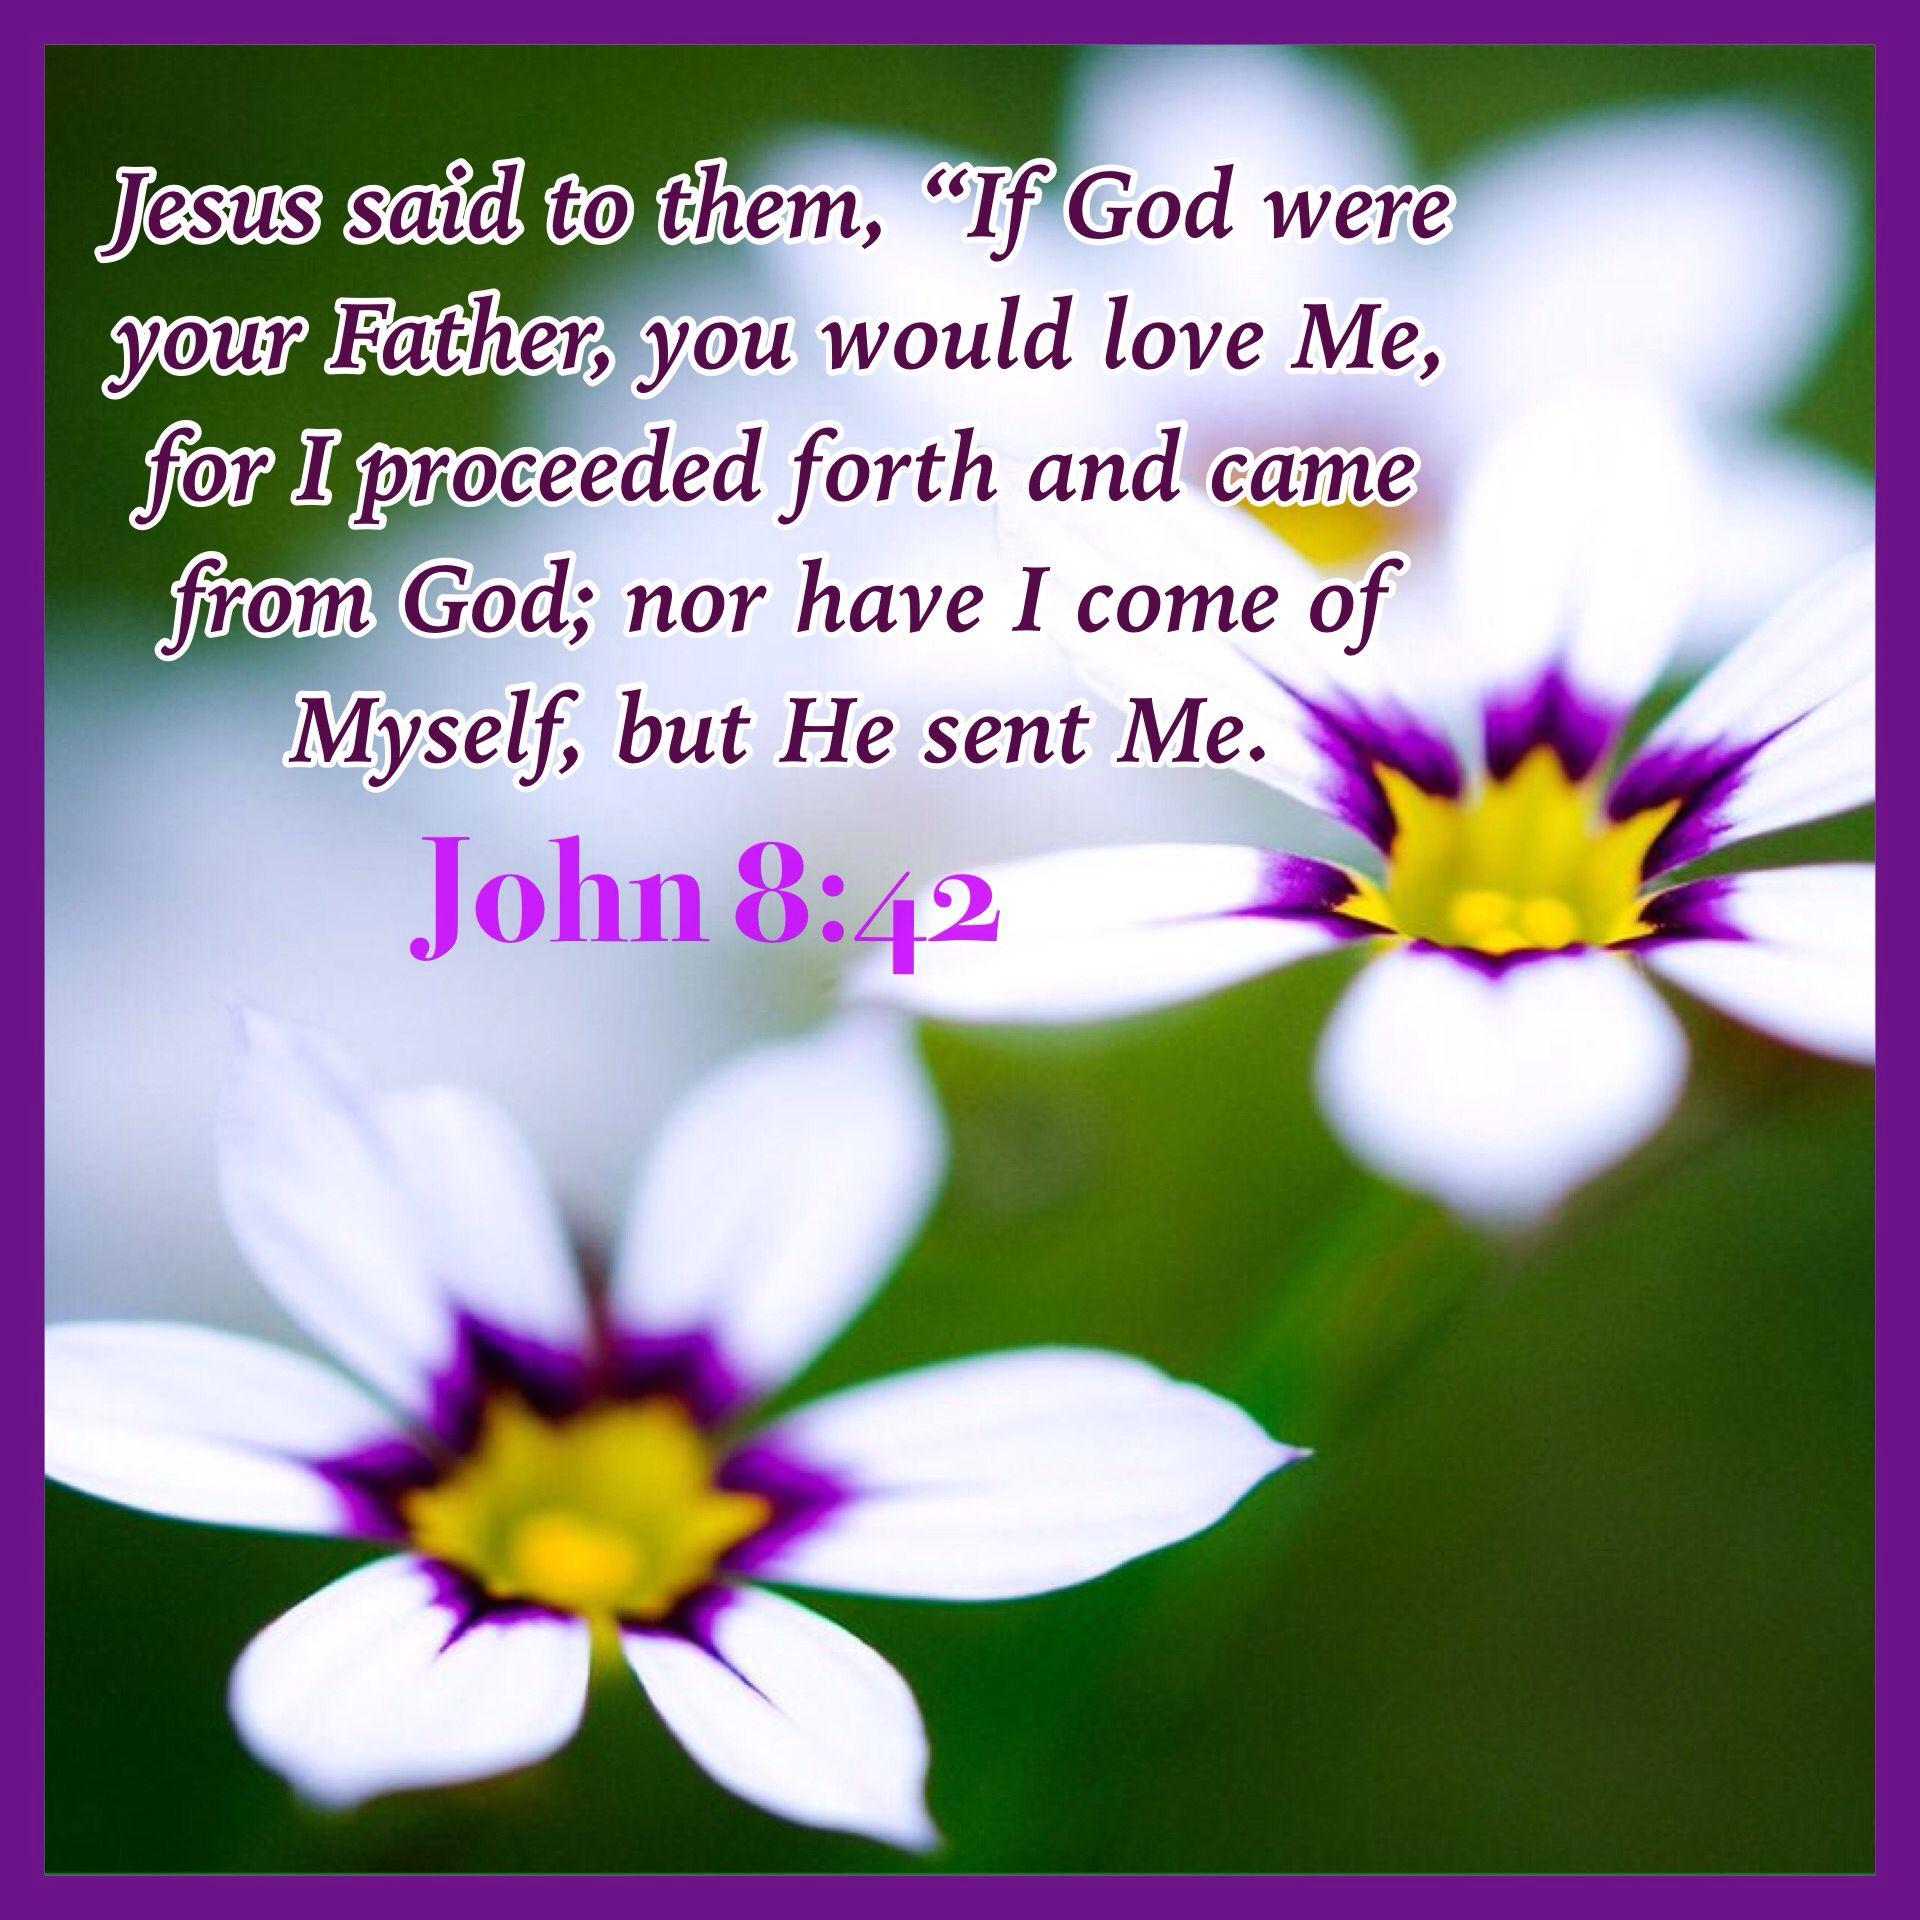 john 8 42 bible scriptures pinterest scriptures bible